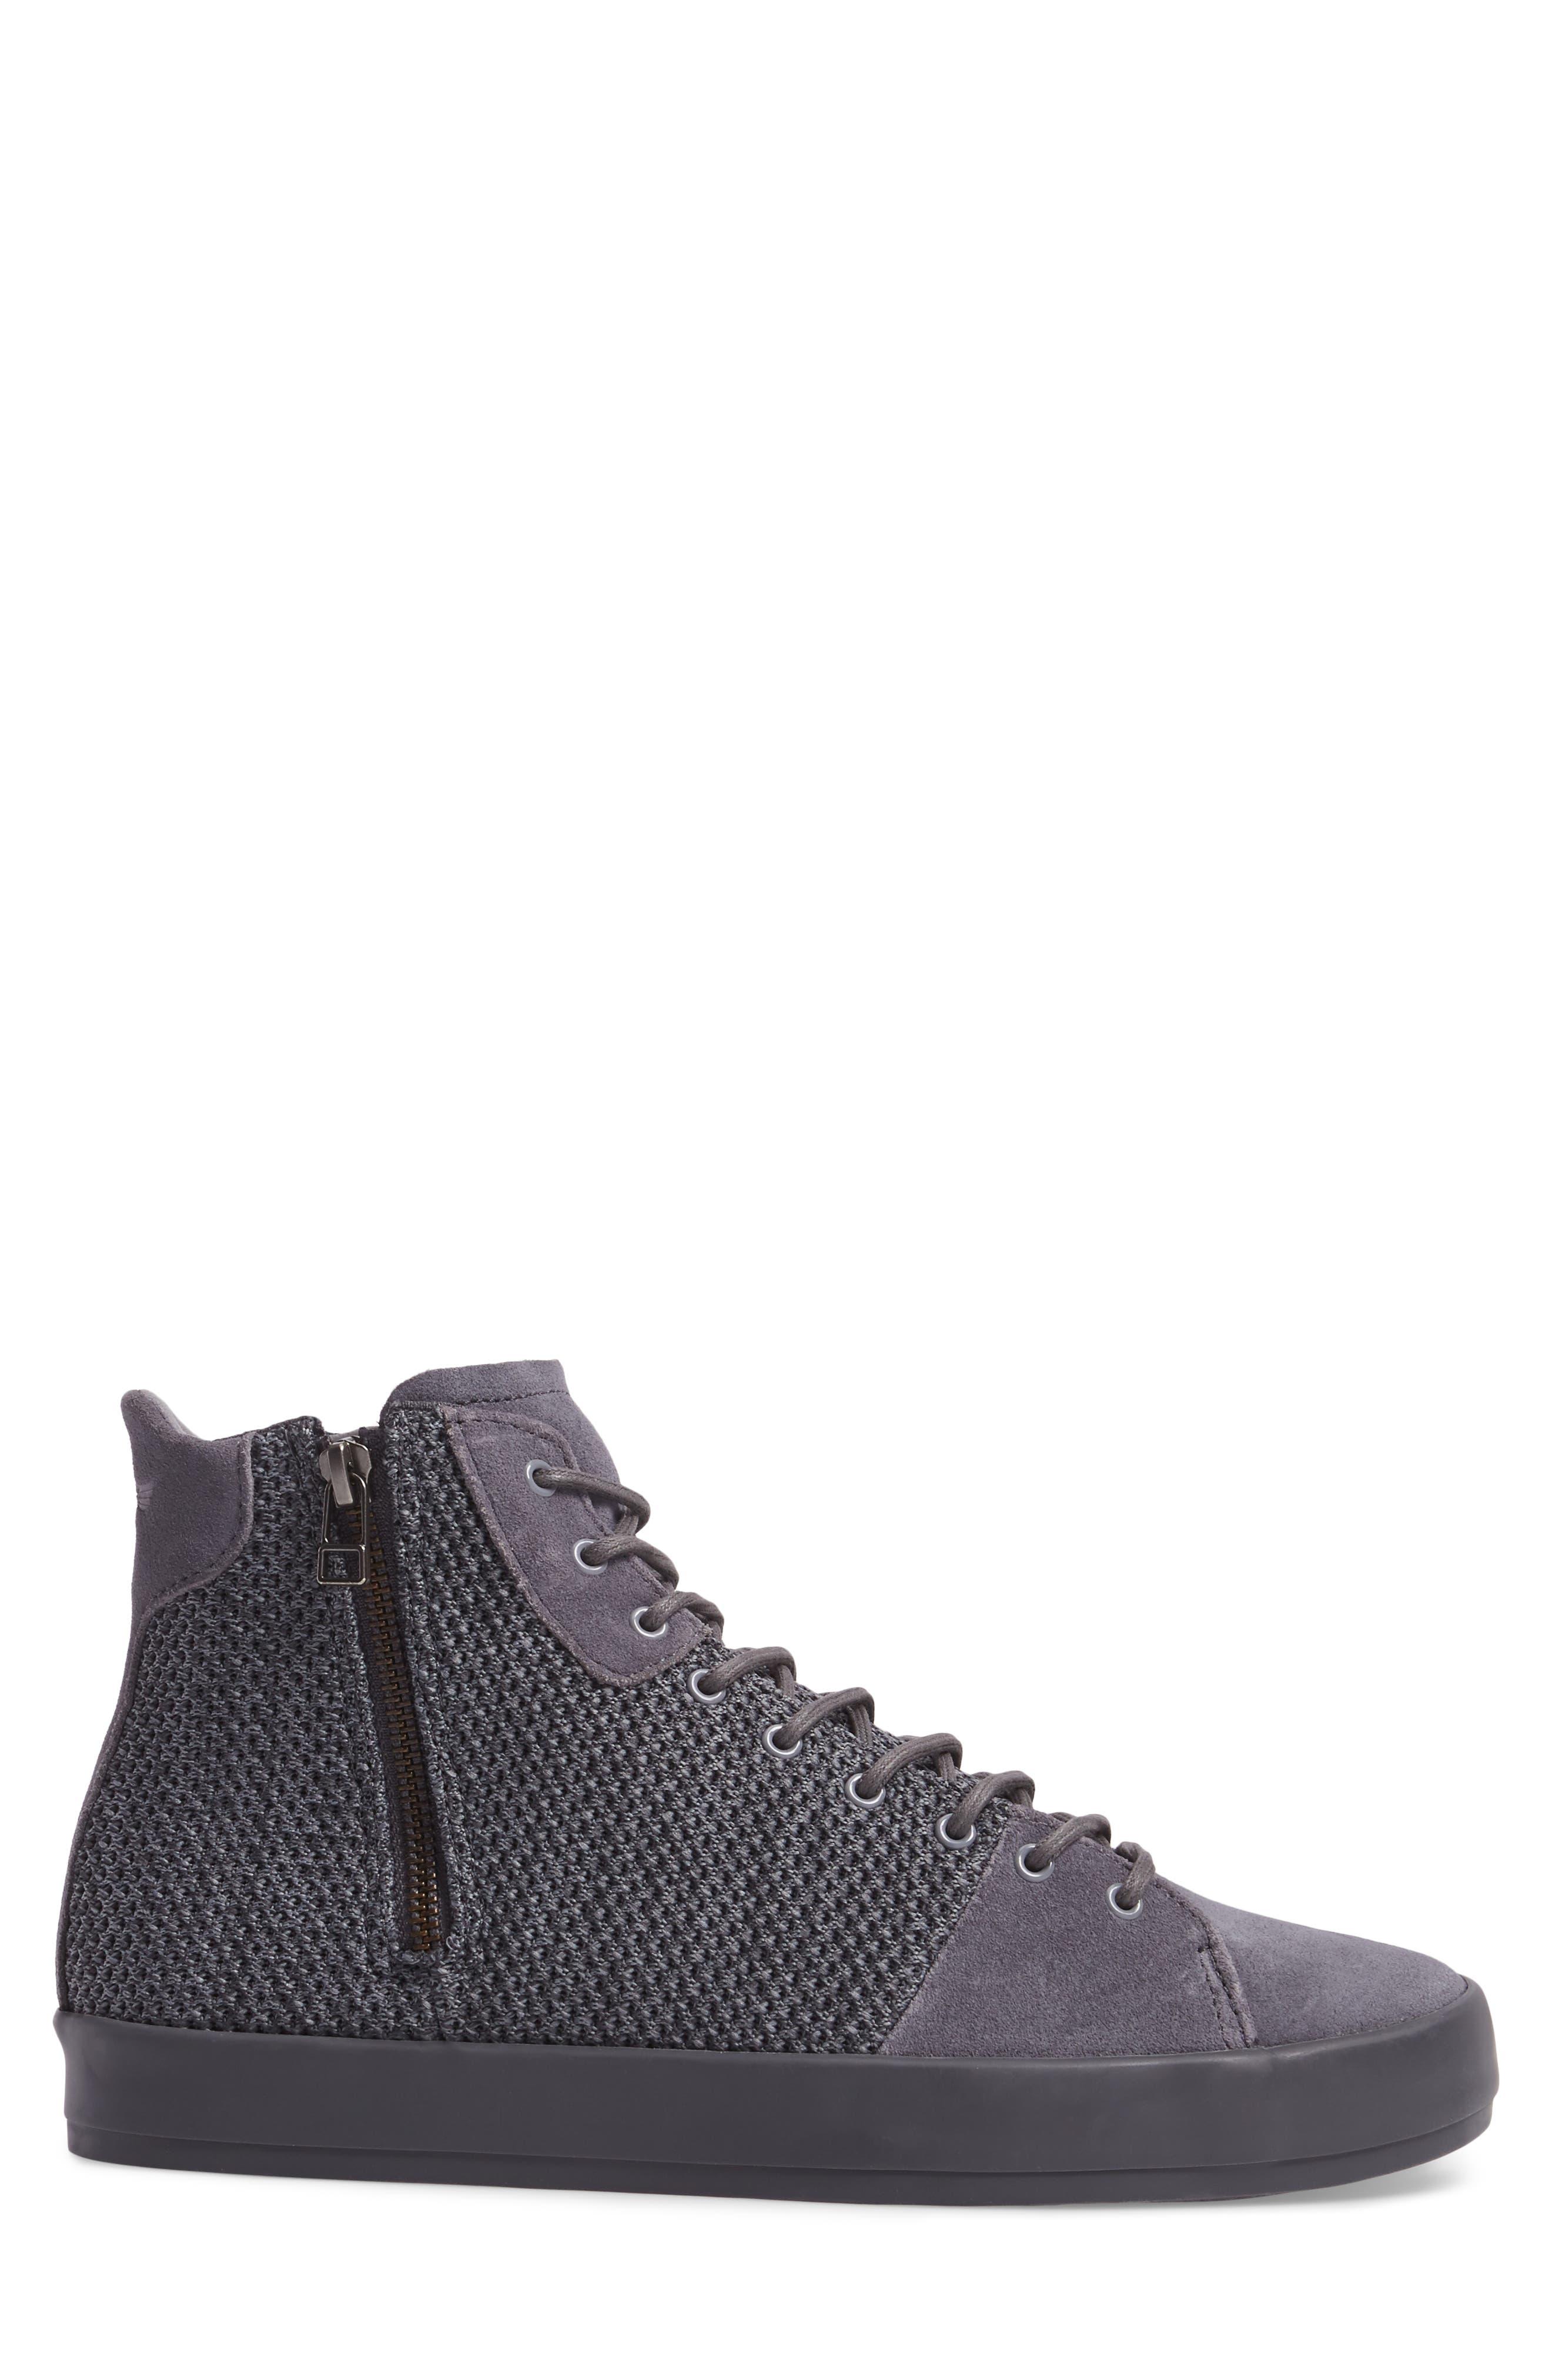 Carda Hi Sneaker,                             Alternate thumbnail 3, color,                             Smoke Leather